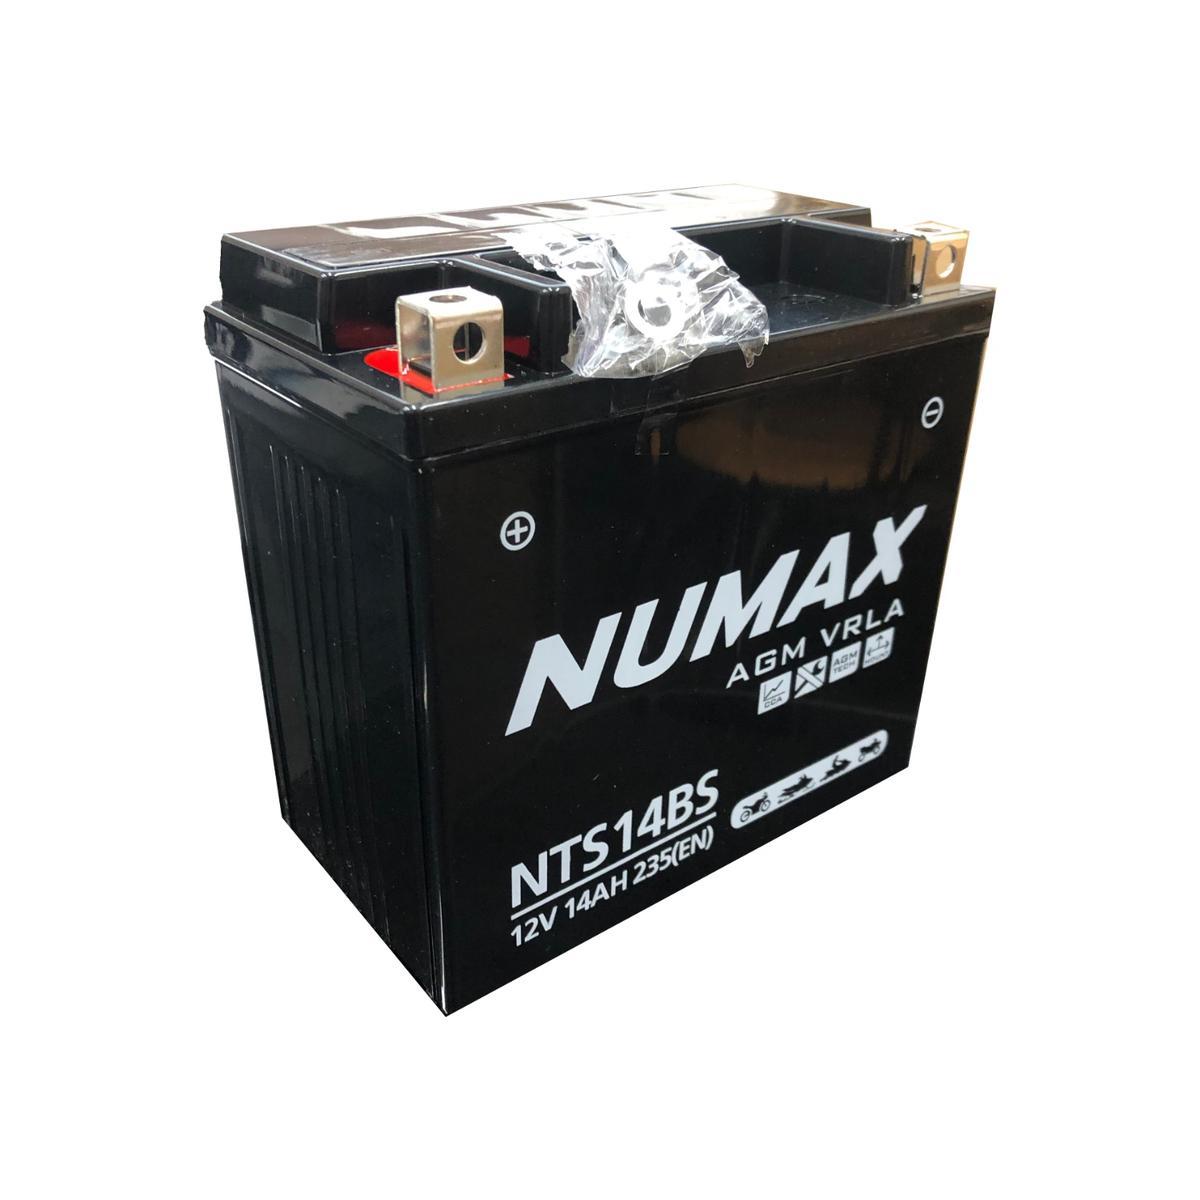 Numax NTS14BS 12v Motorbike Bike Battery YAMAHA 1200cc FJ1200 91 93 YTX14-4